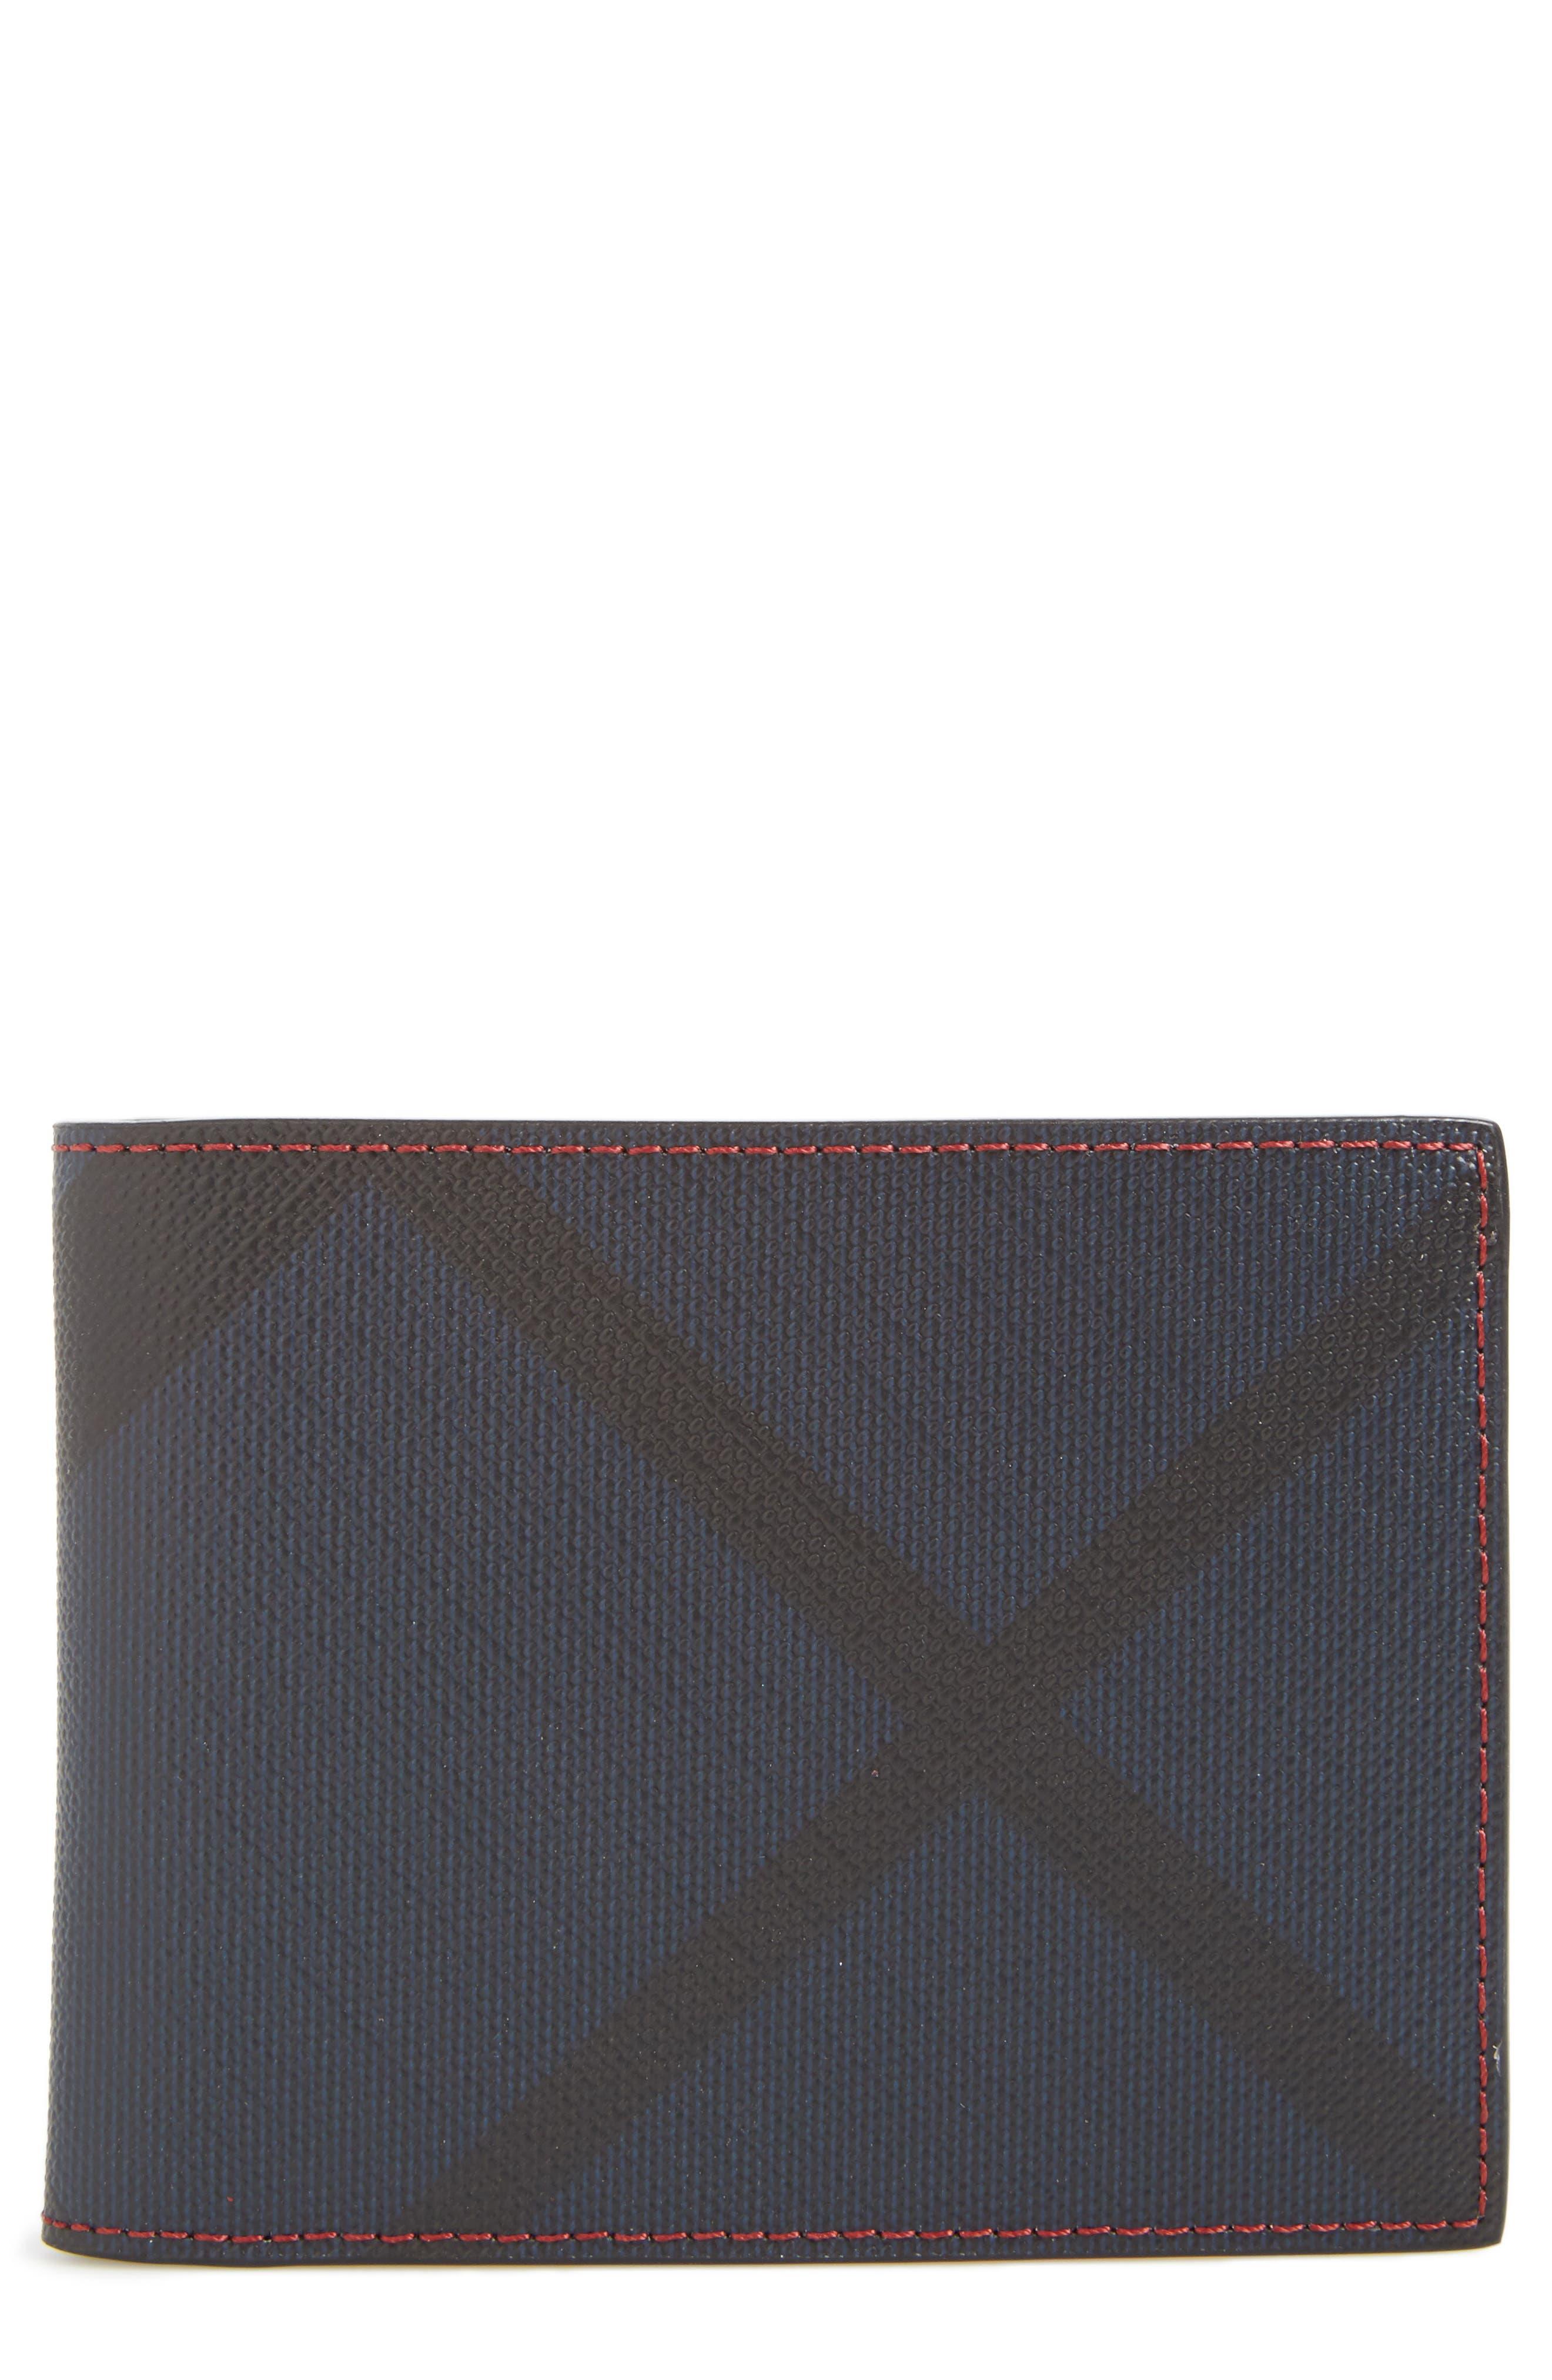 Sandon Wallet,                         Main,                         color, 604